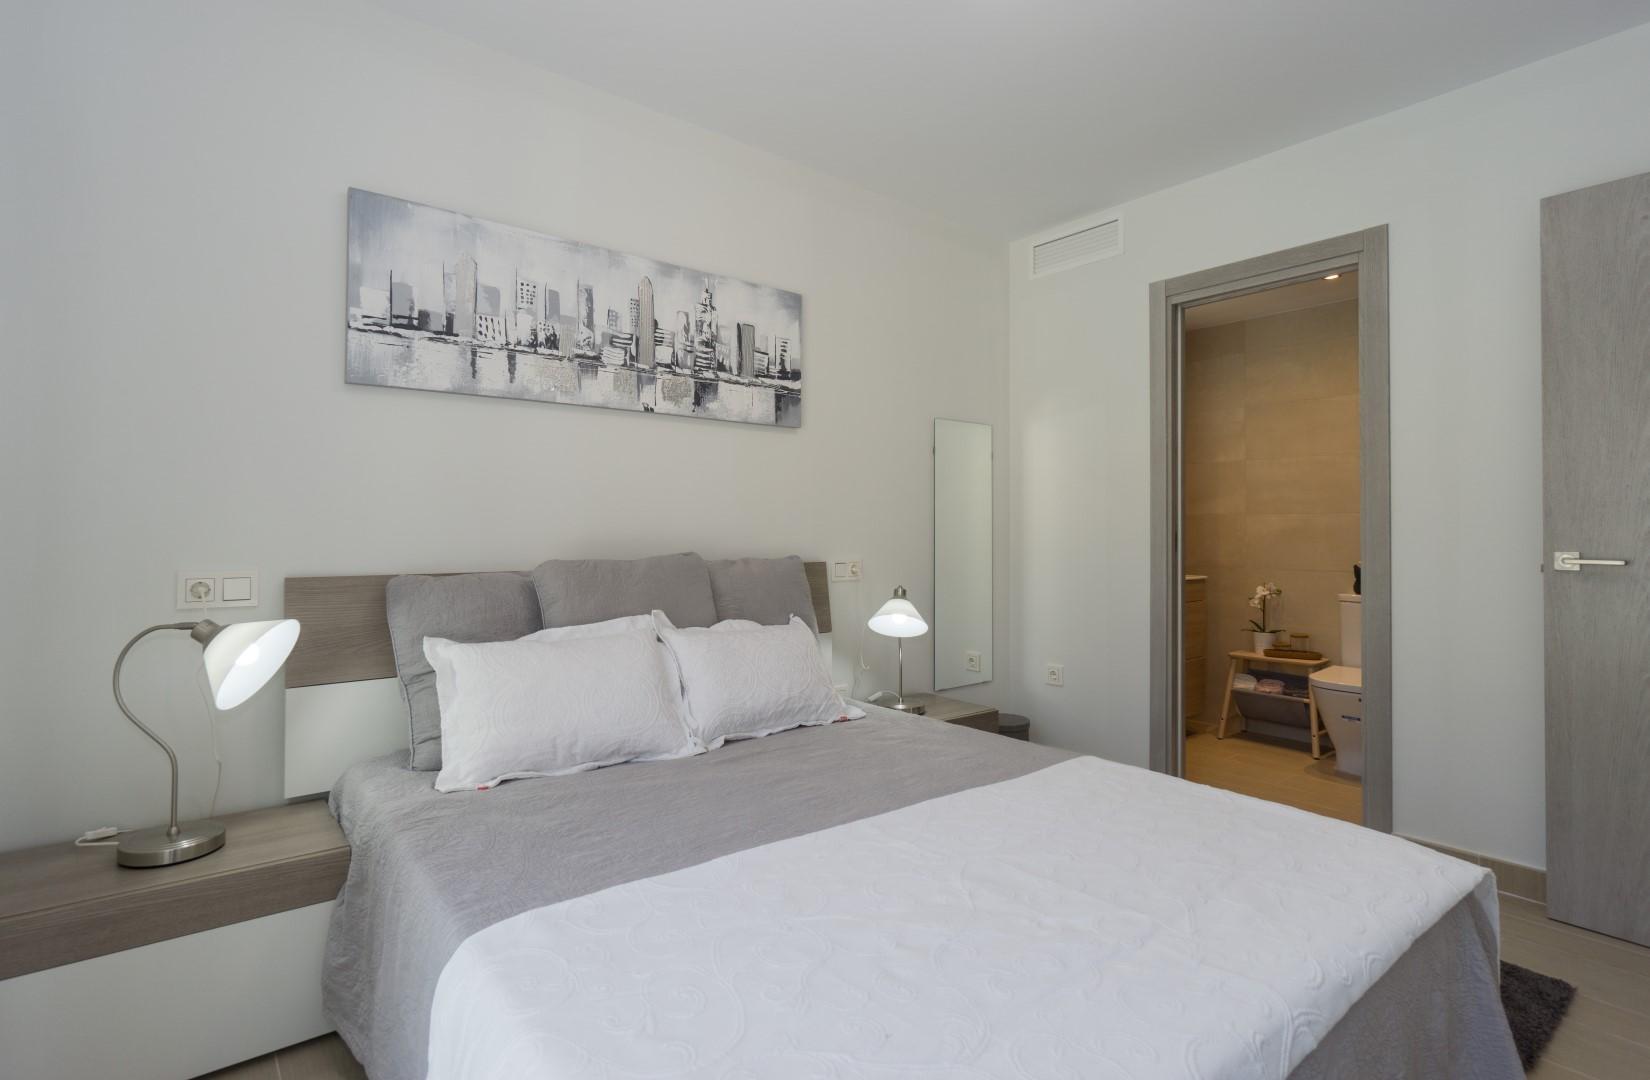 Apartment in Benalmadena MA3142741 12